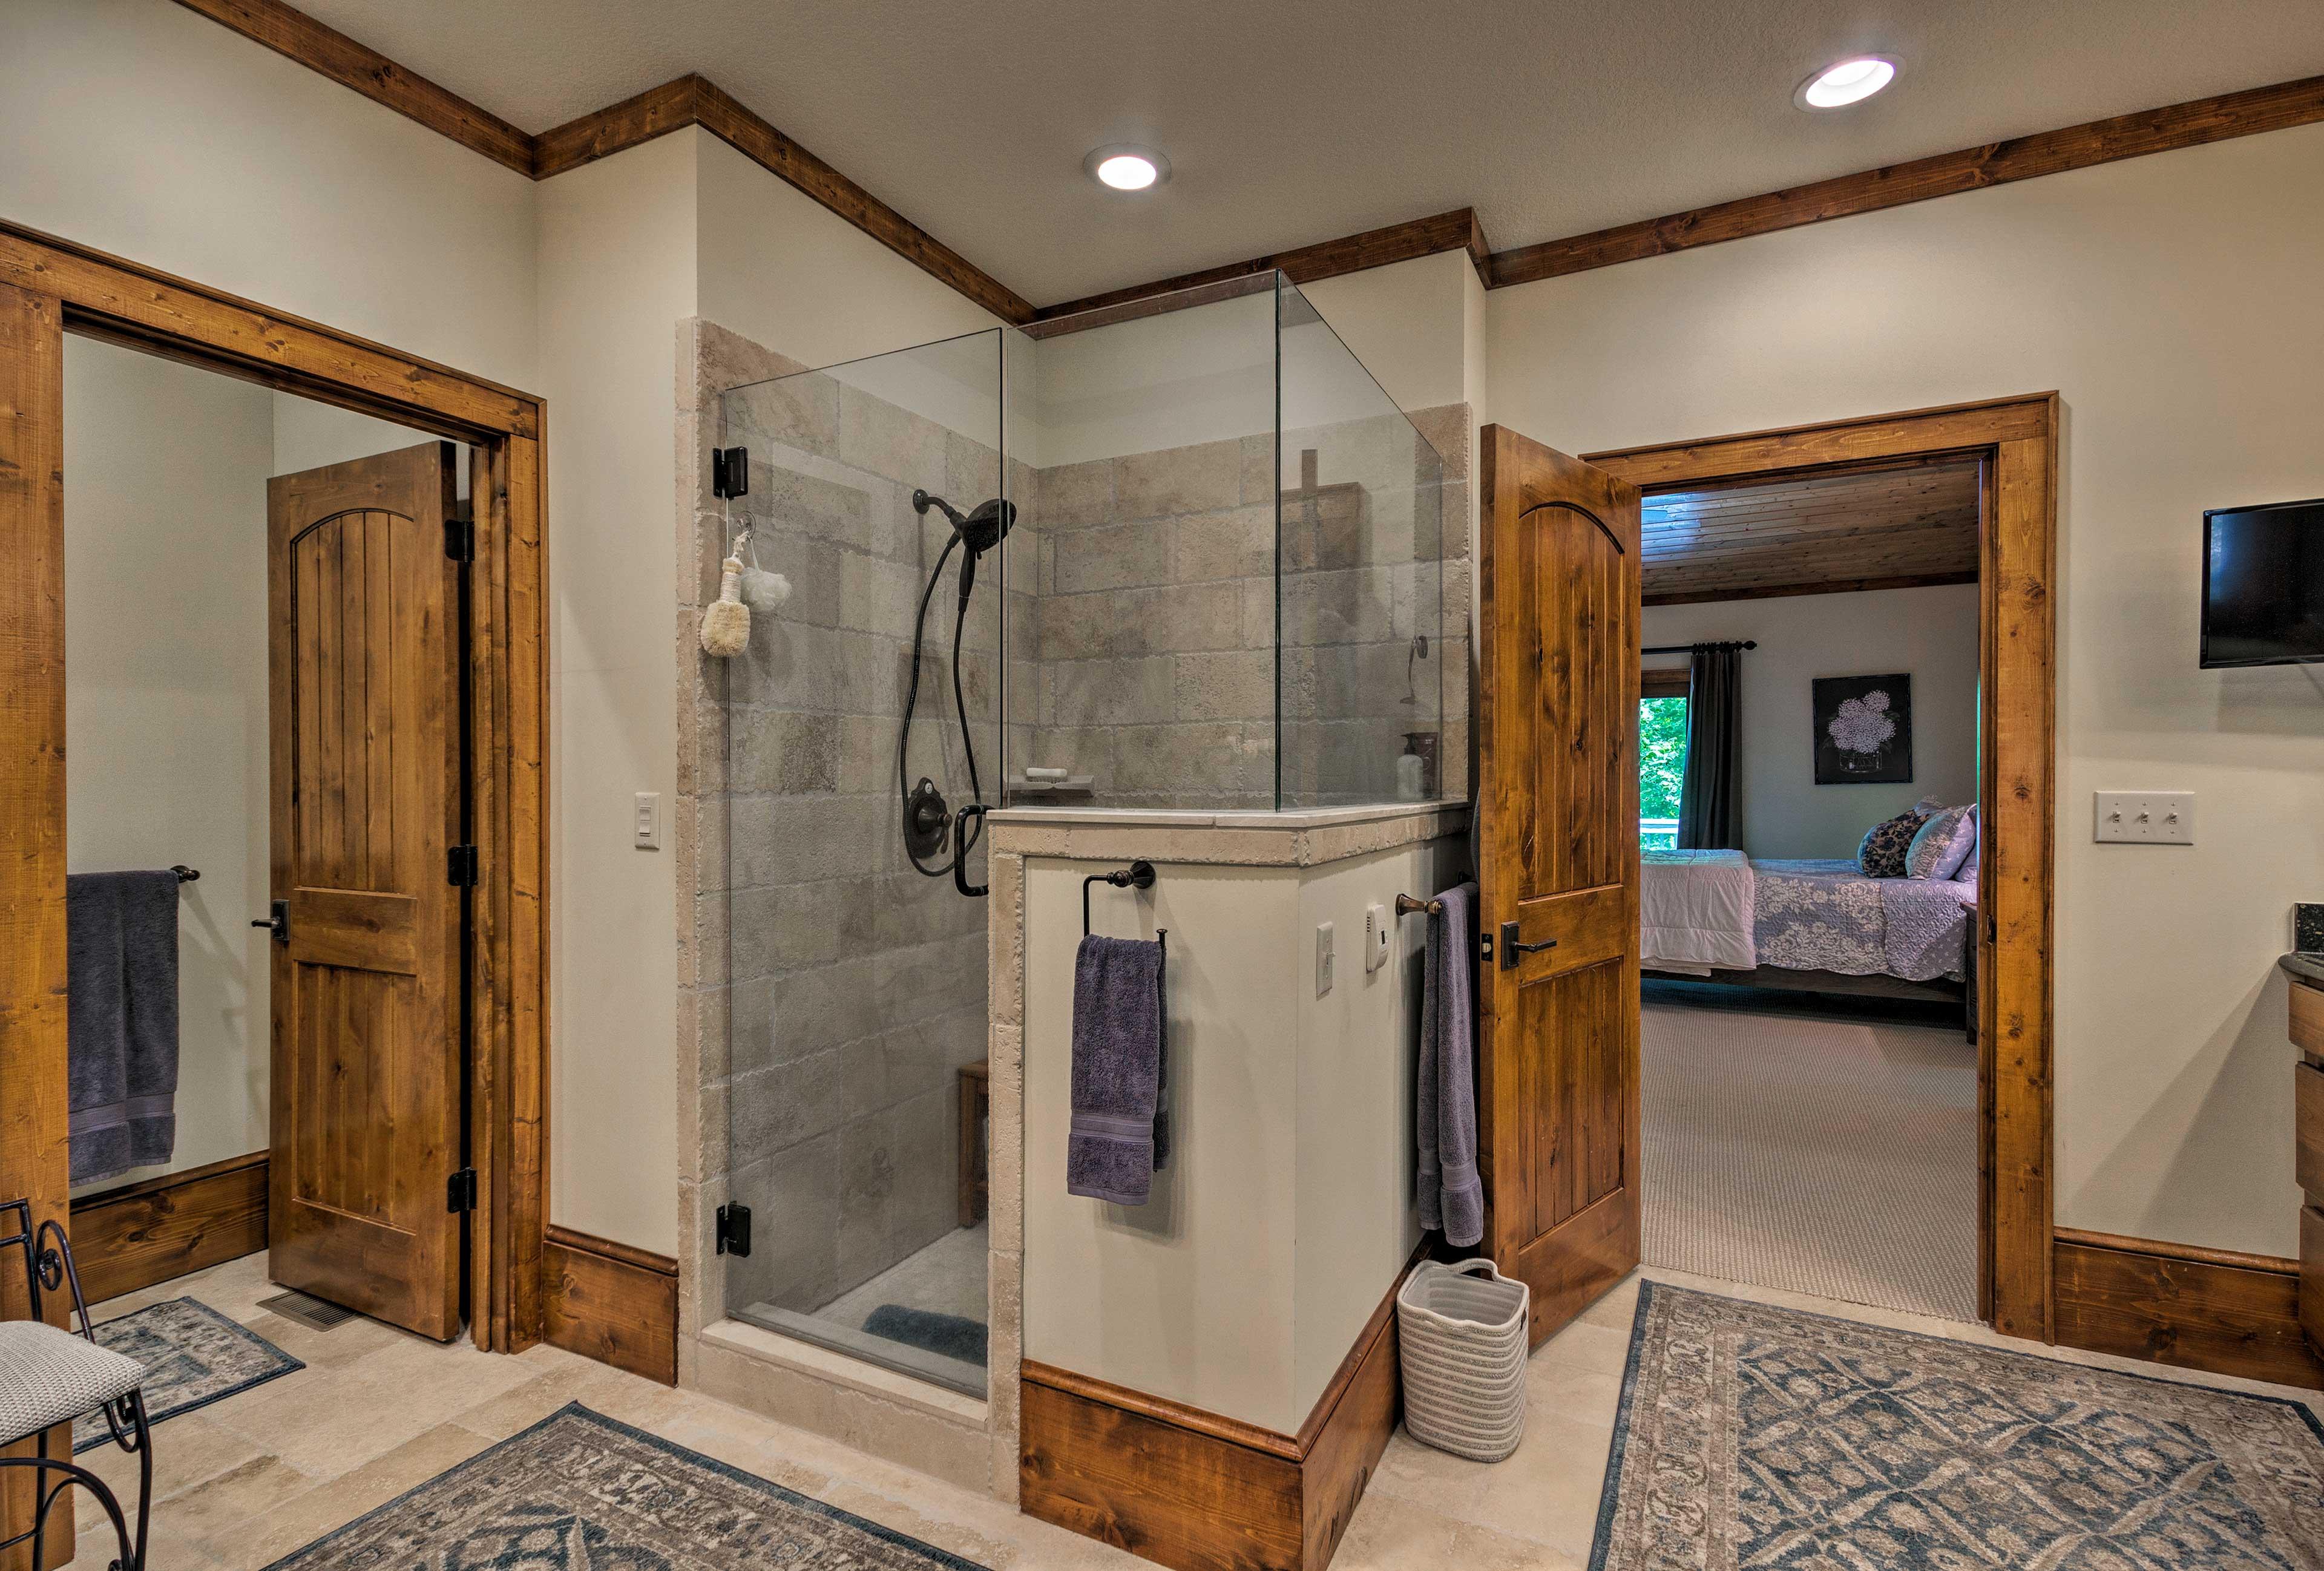 The bathroom has heated floors and a flat-screen Smart TV.